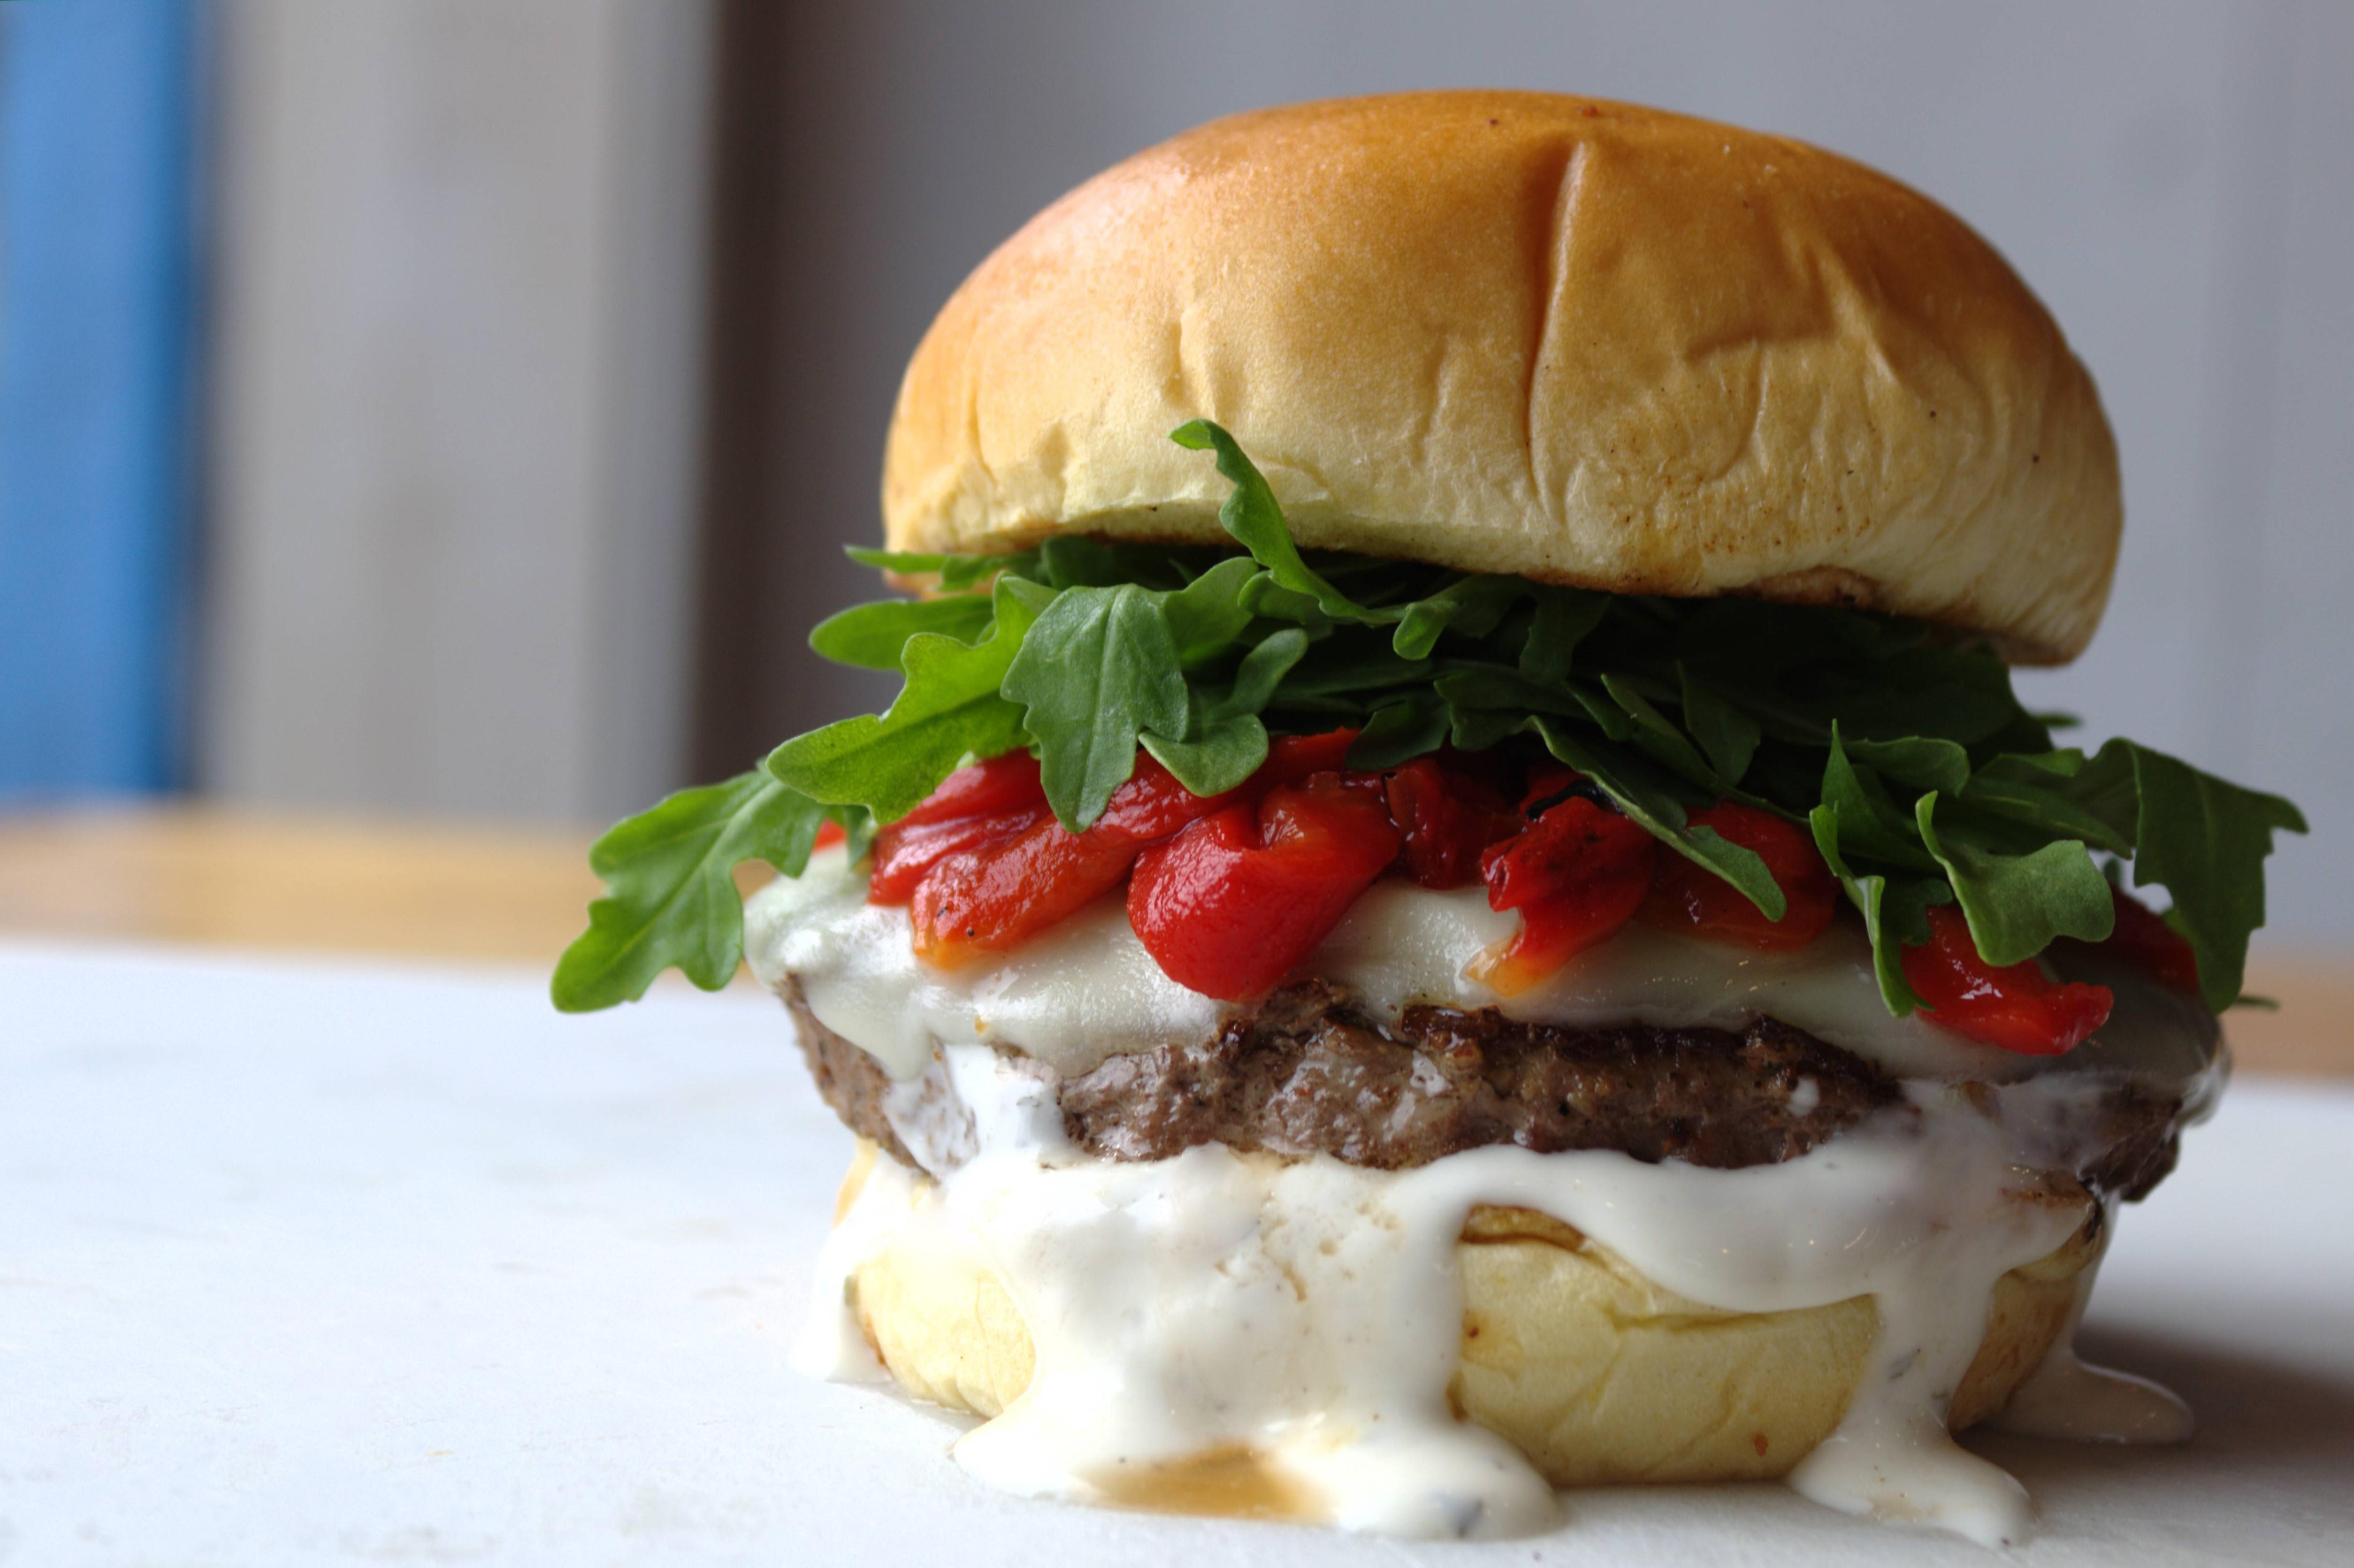 Lion King Themed Burger Debuting this July at Boulevard Burgers & Tap House